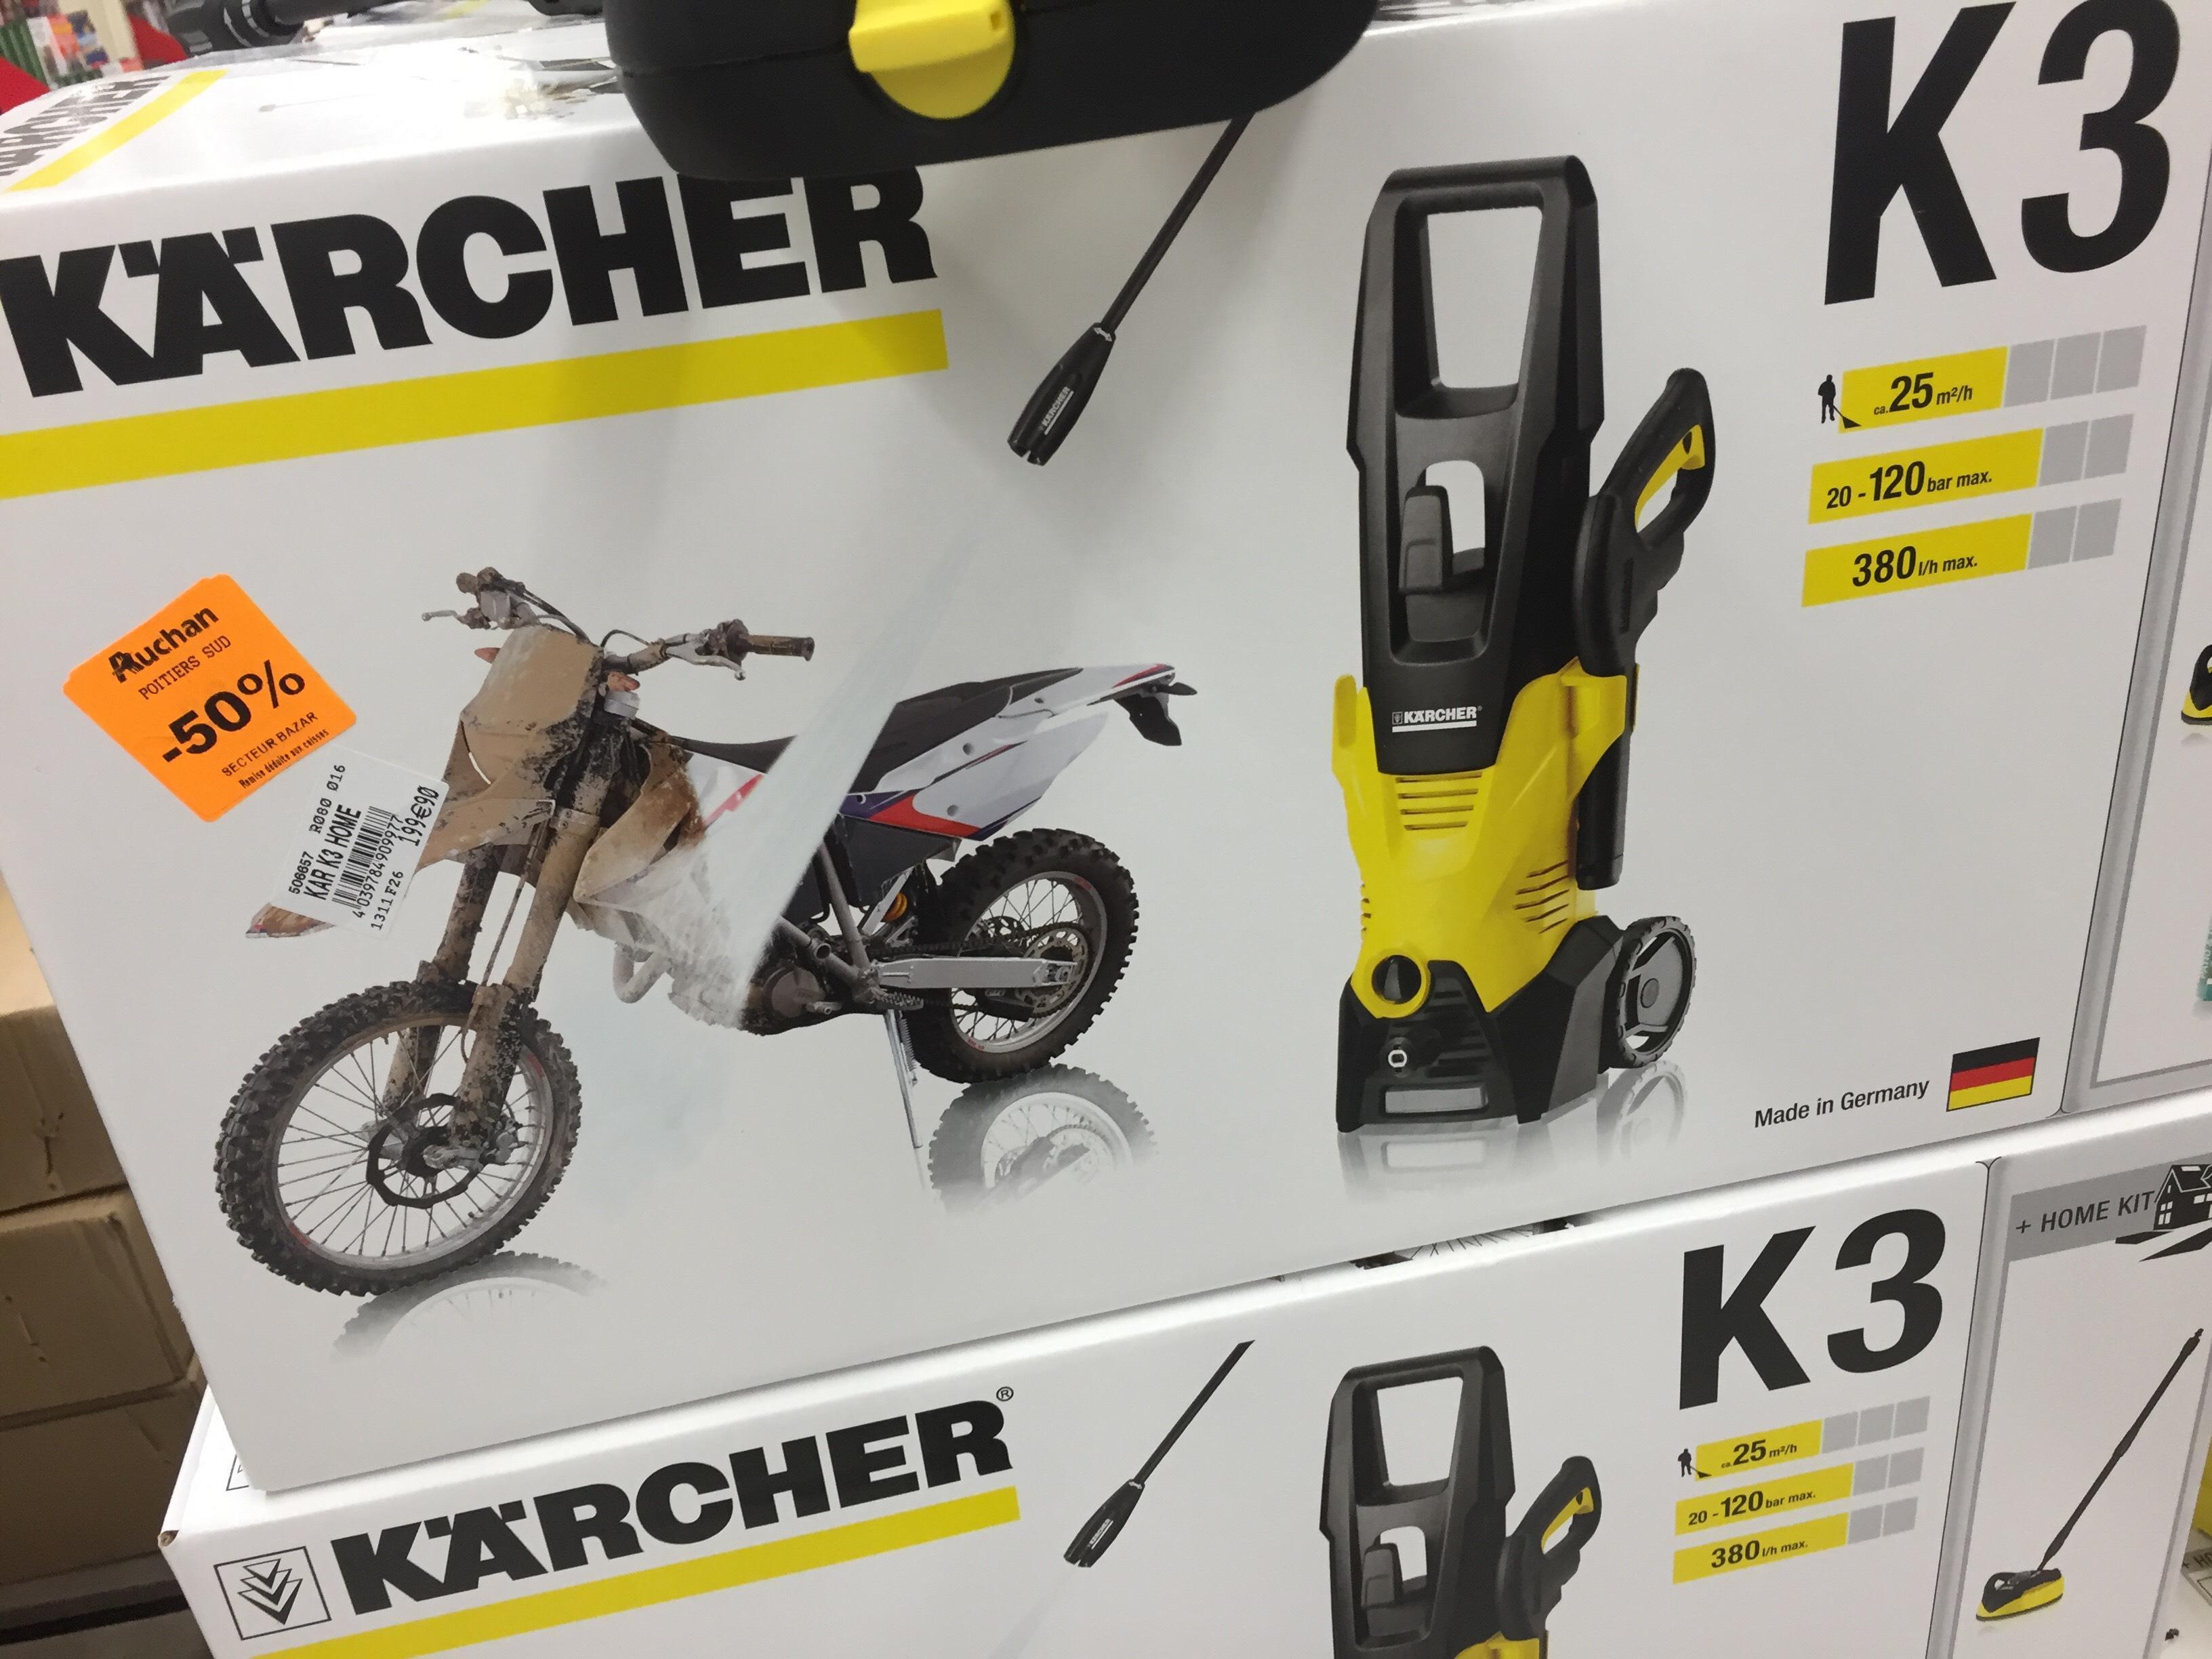 Nettoyeur haute pression Karcher K3 Home T350